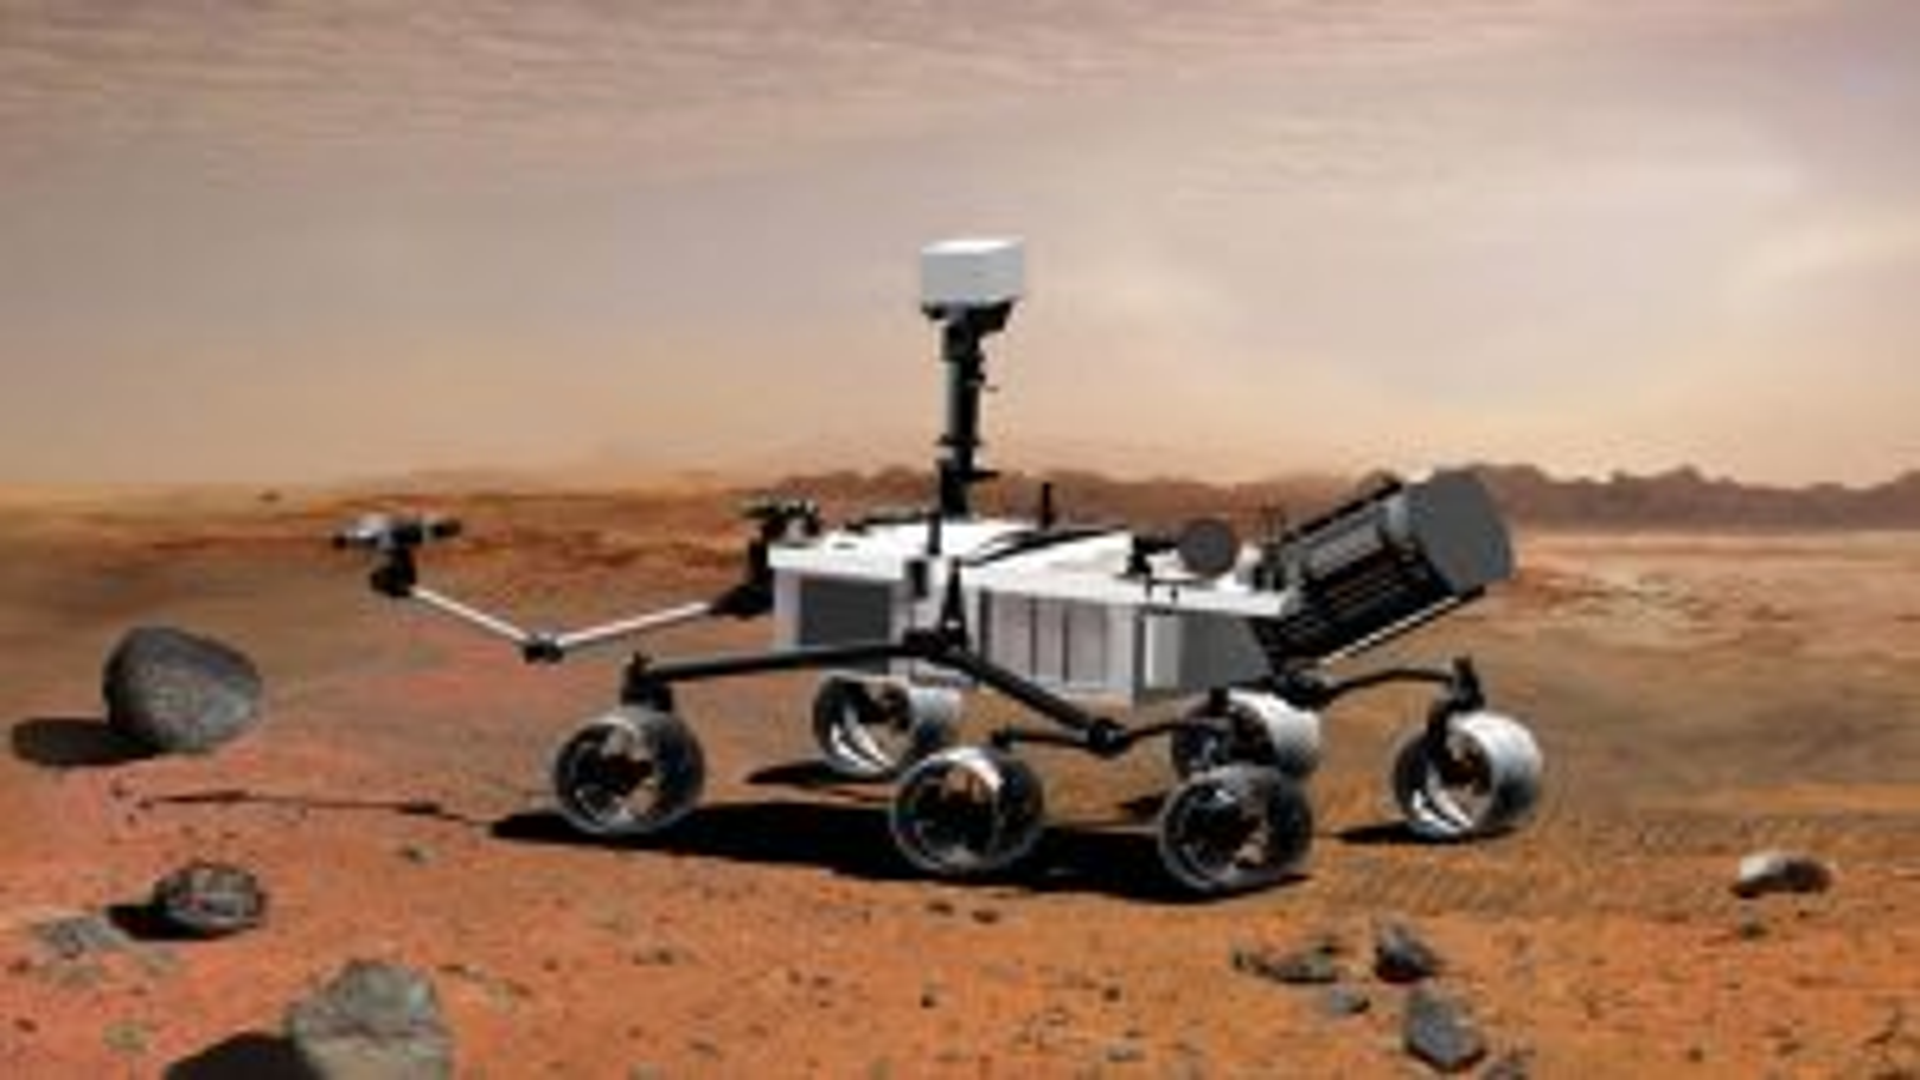 سقوط مریخ نورد آژانس فضایی اروپا | فیلم